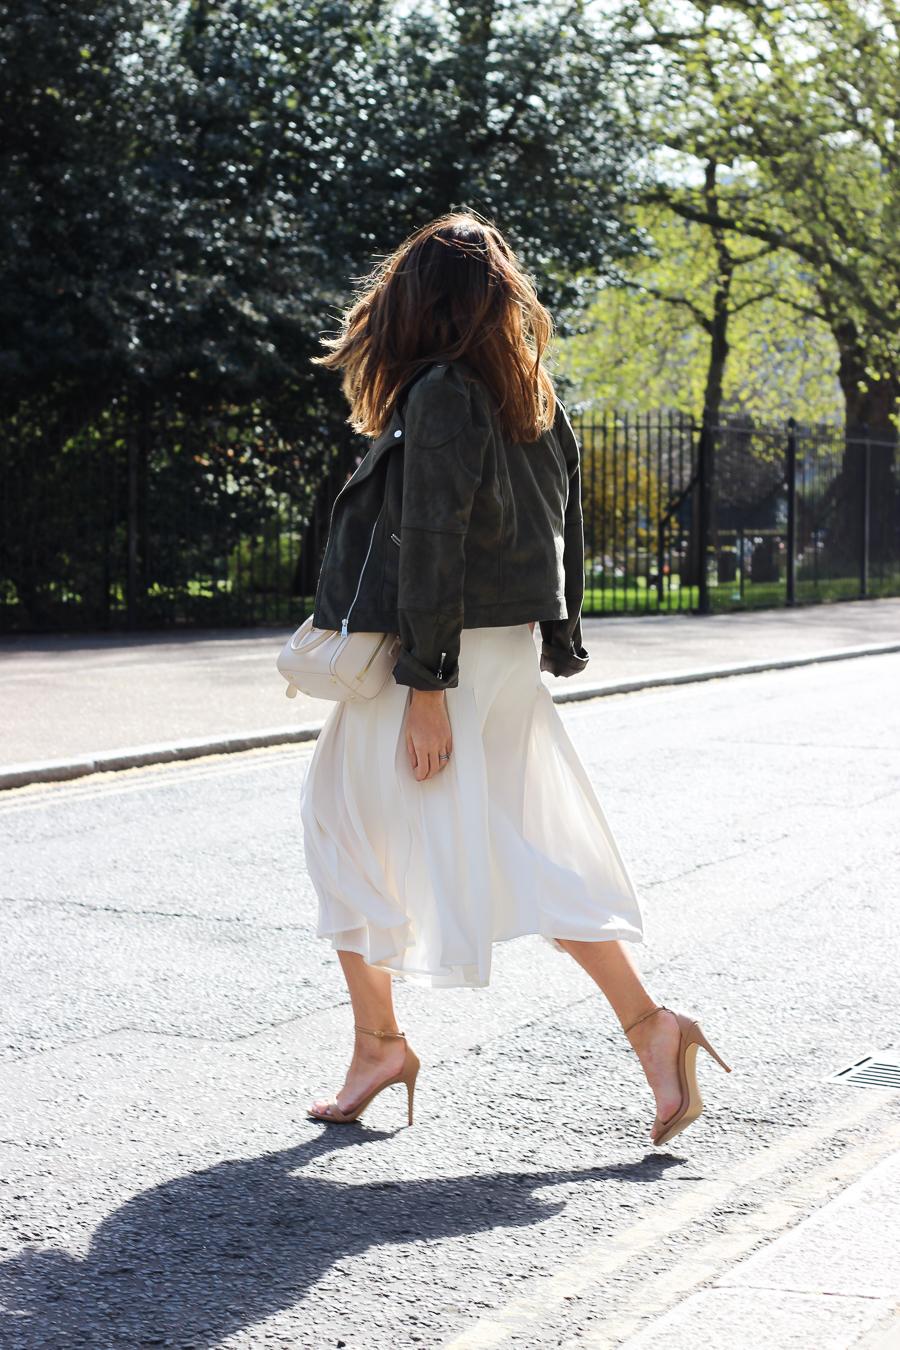 Folli Follie UK - Clutch and carry on - uk travel blogger, uk fashion blogger, london street style, sabrina chakici tblogger-35